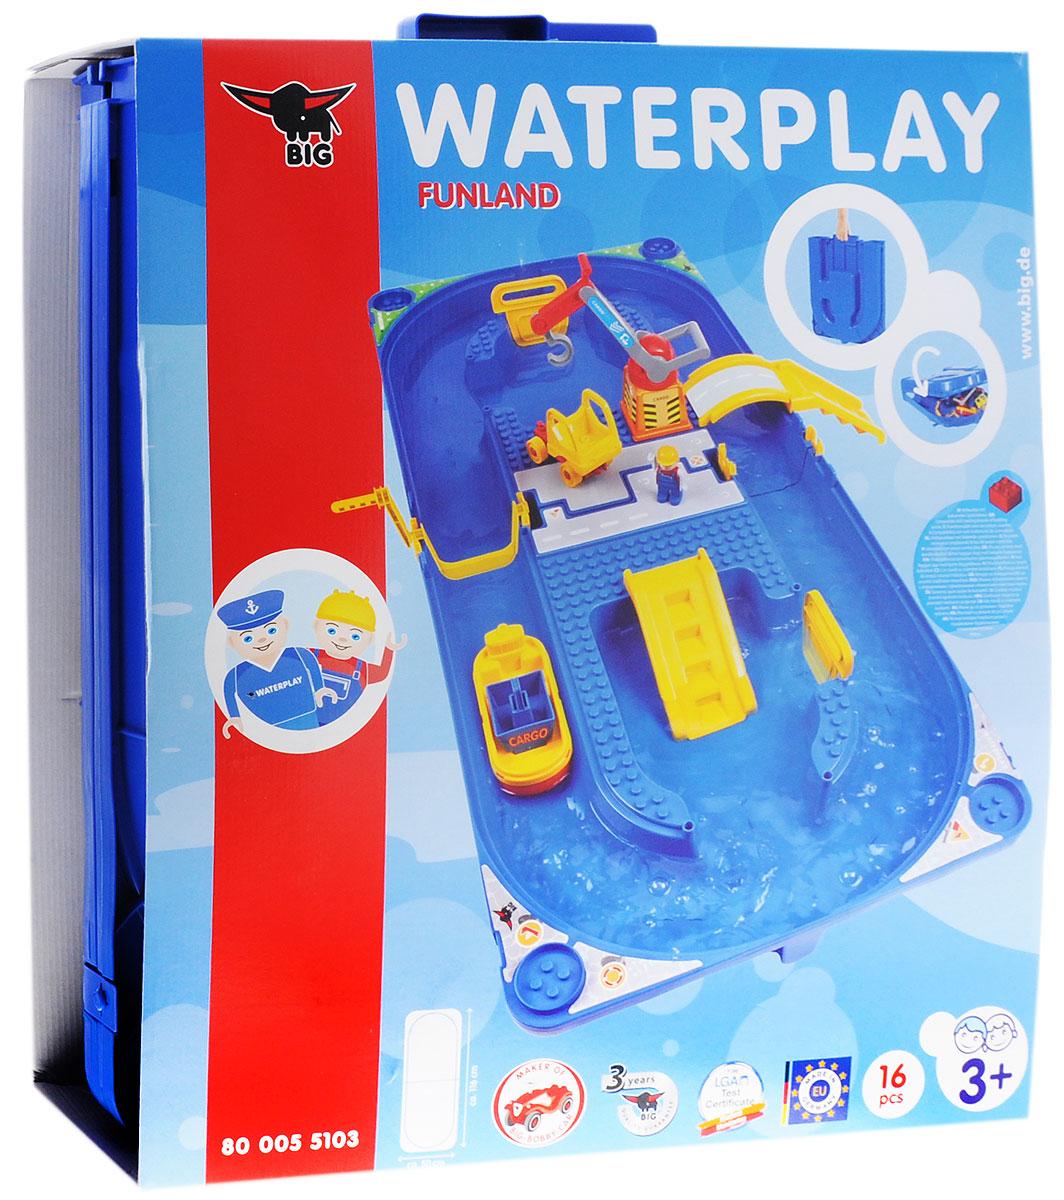 Big ������ ���� Waterplay Funland